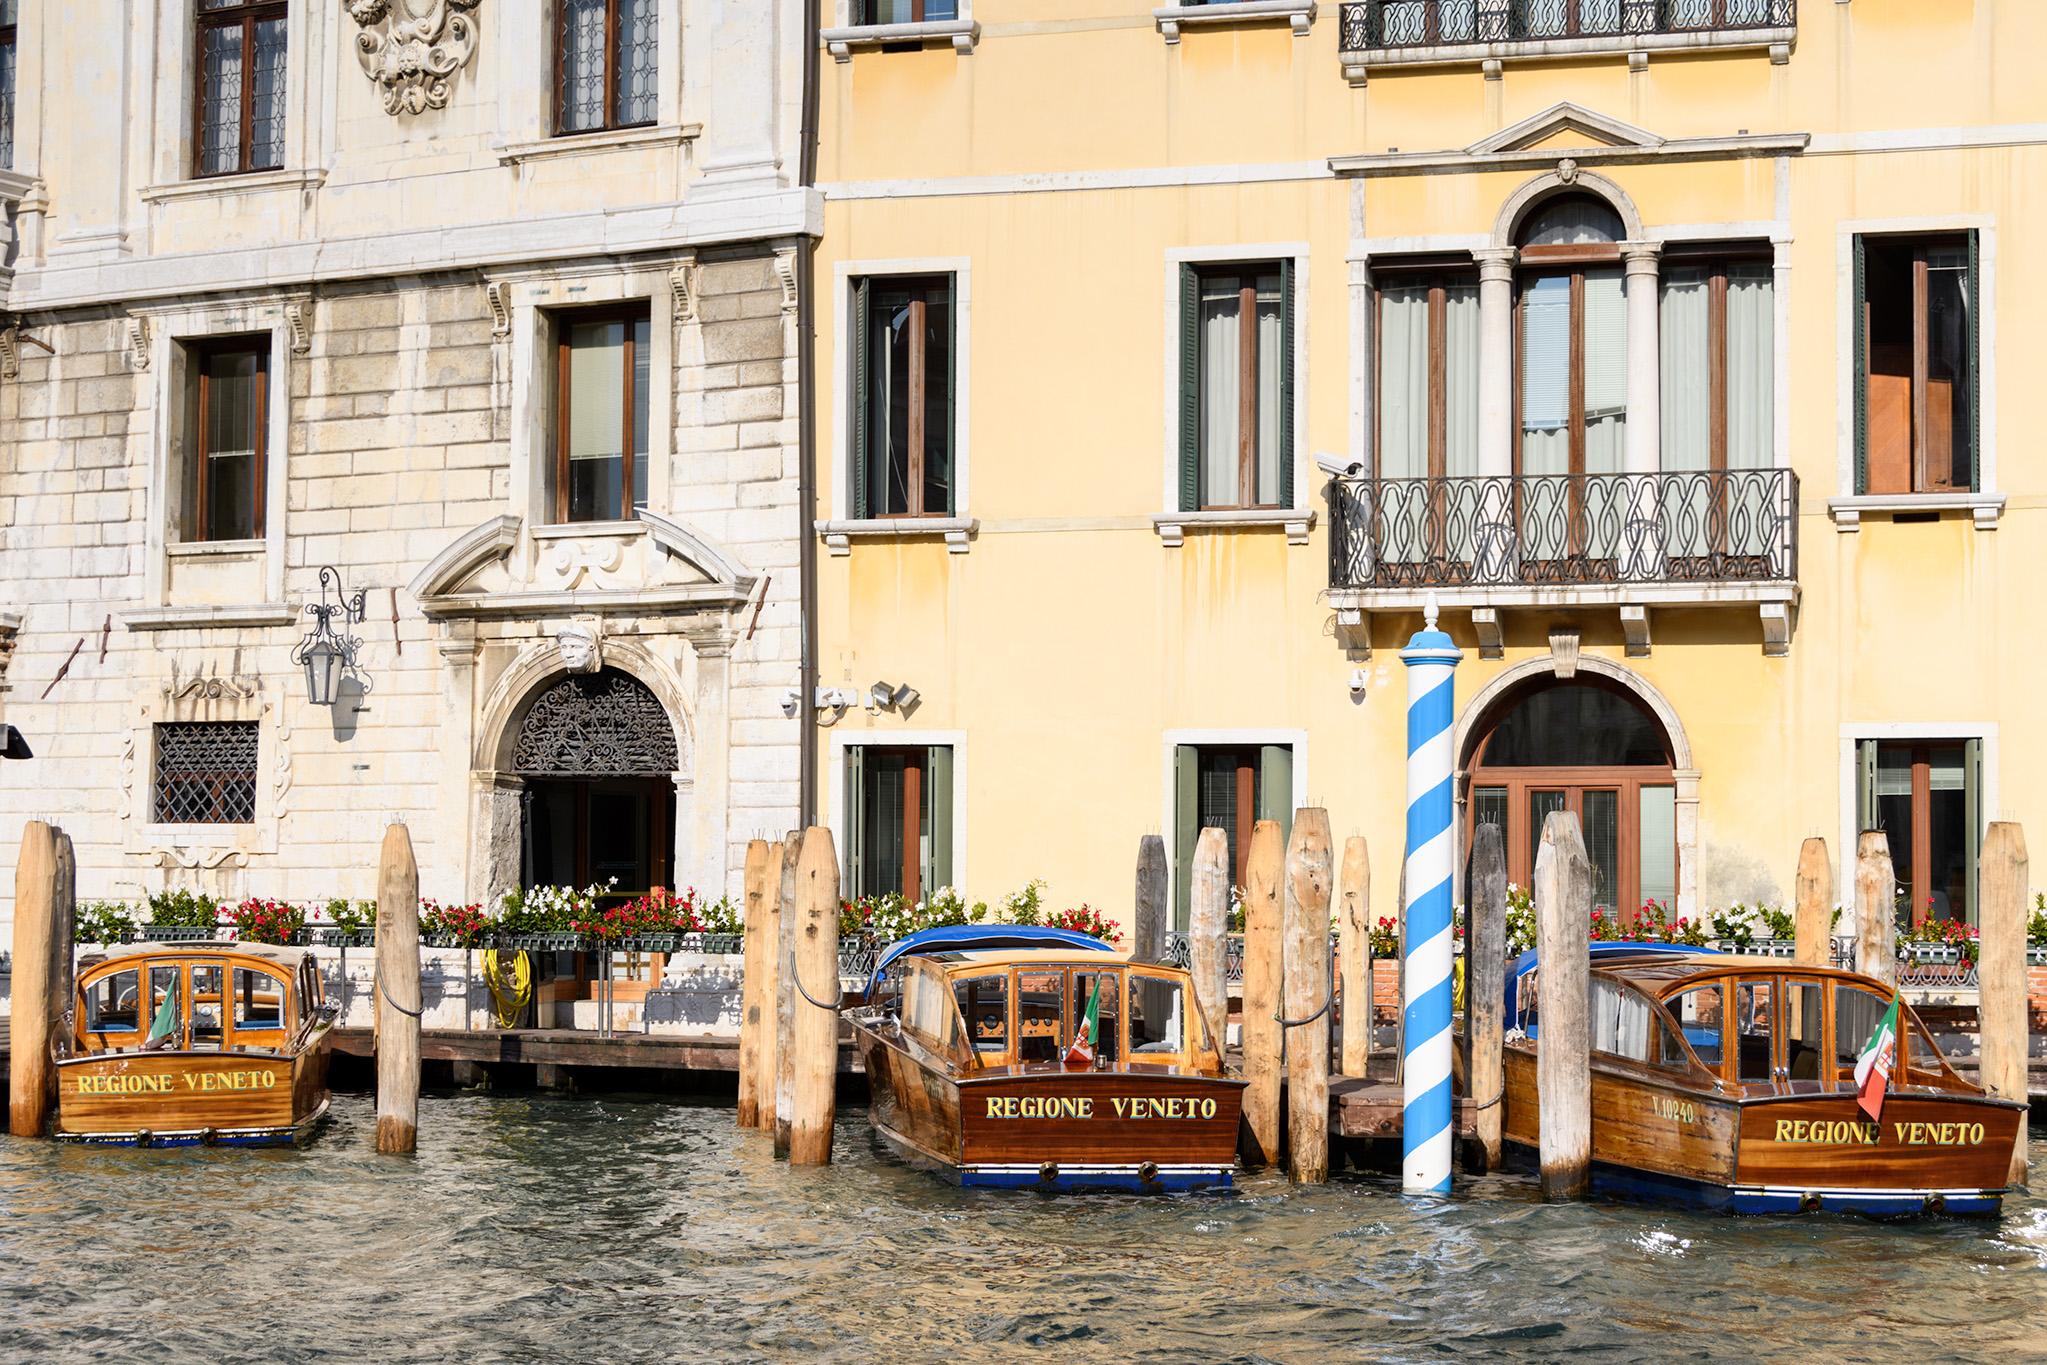 20171002 - Venice - 201.jpg